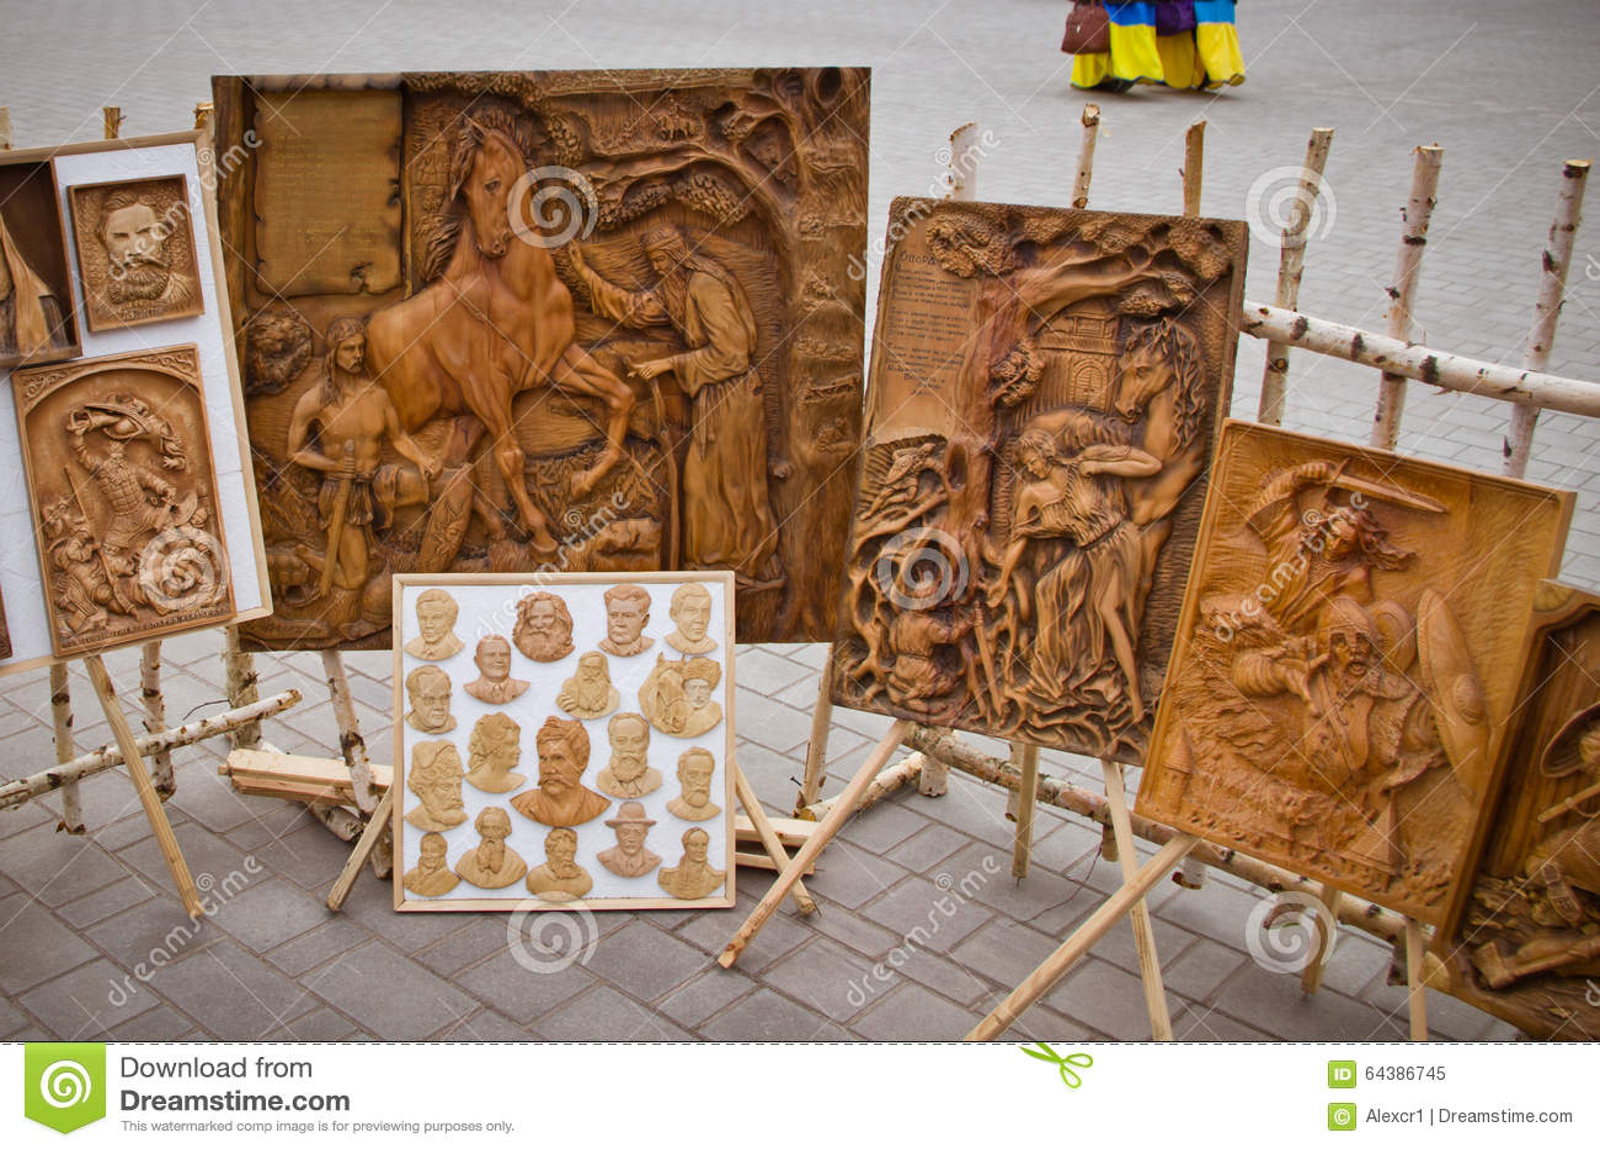 Pinturas de madera talladas al aire libre imagen editorial - Pinturas de madera ...